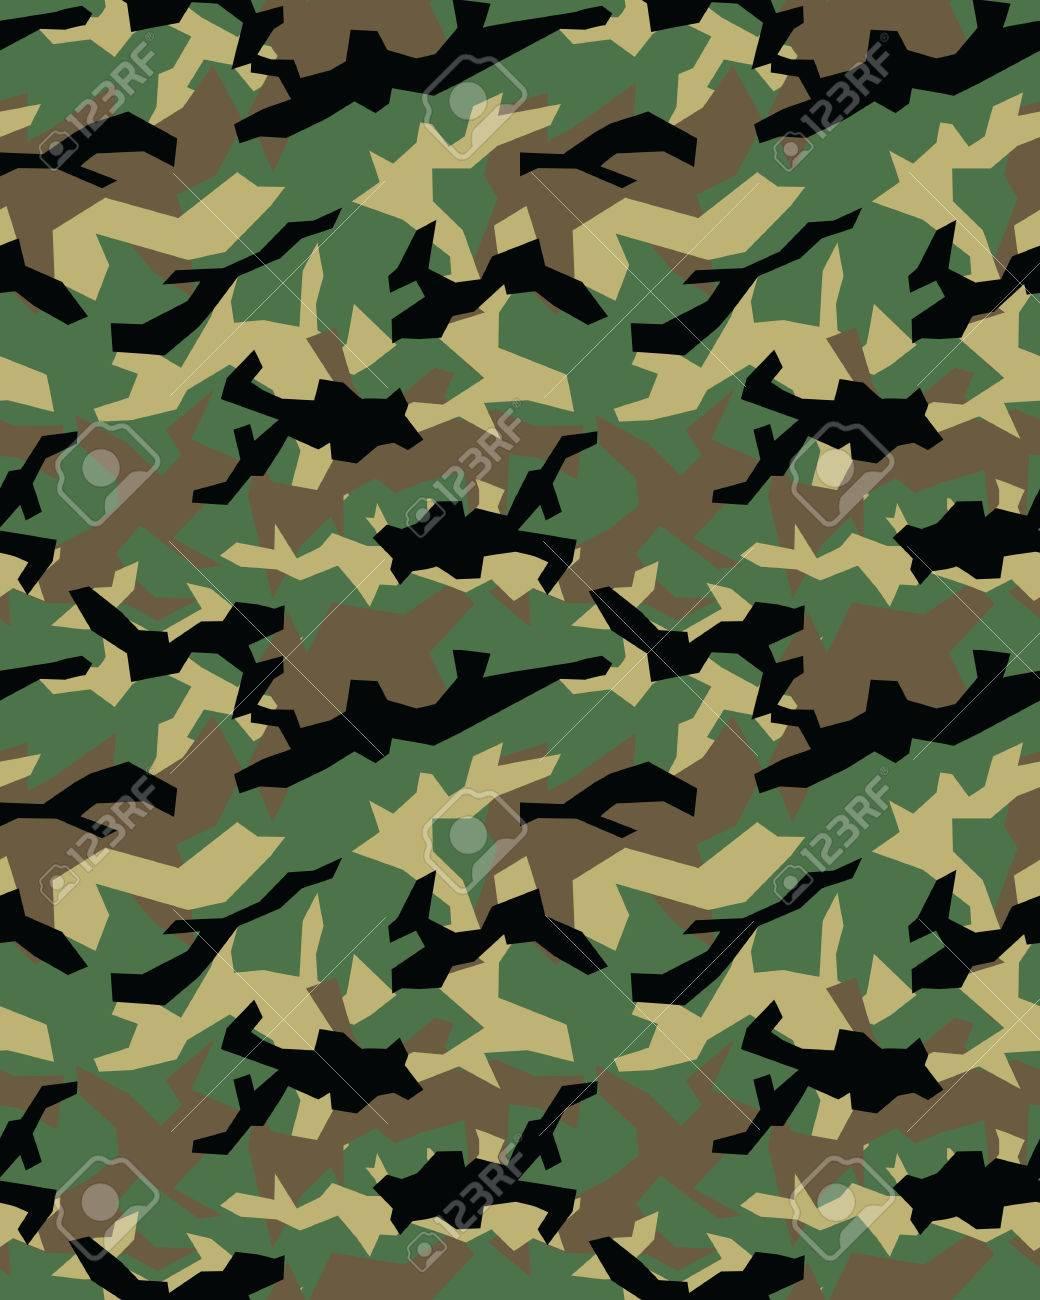 54 Free Army Camo Wallpaper On Wallpapersafari